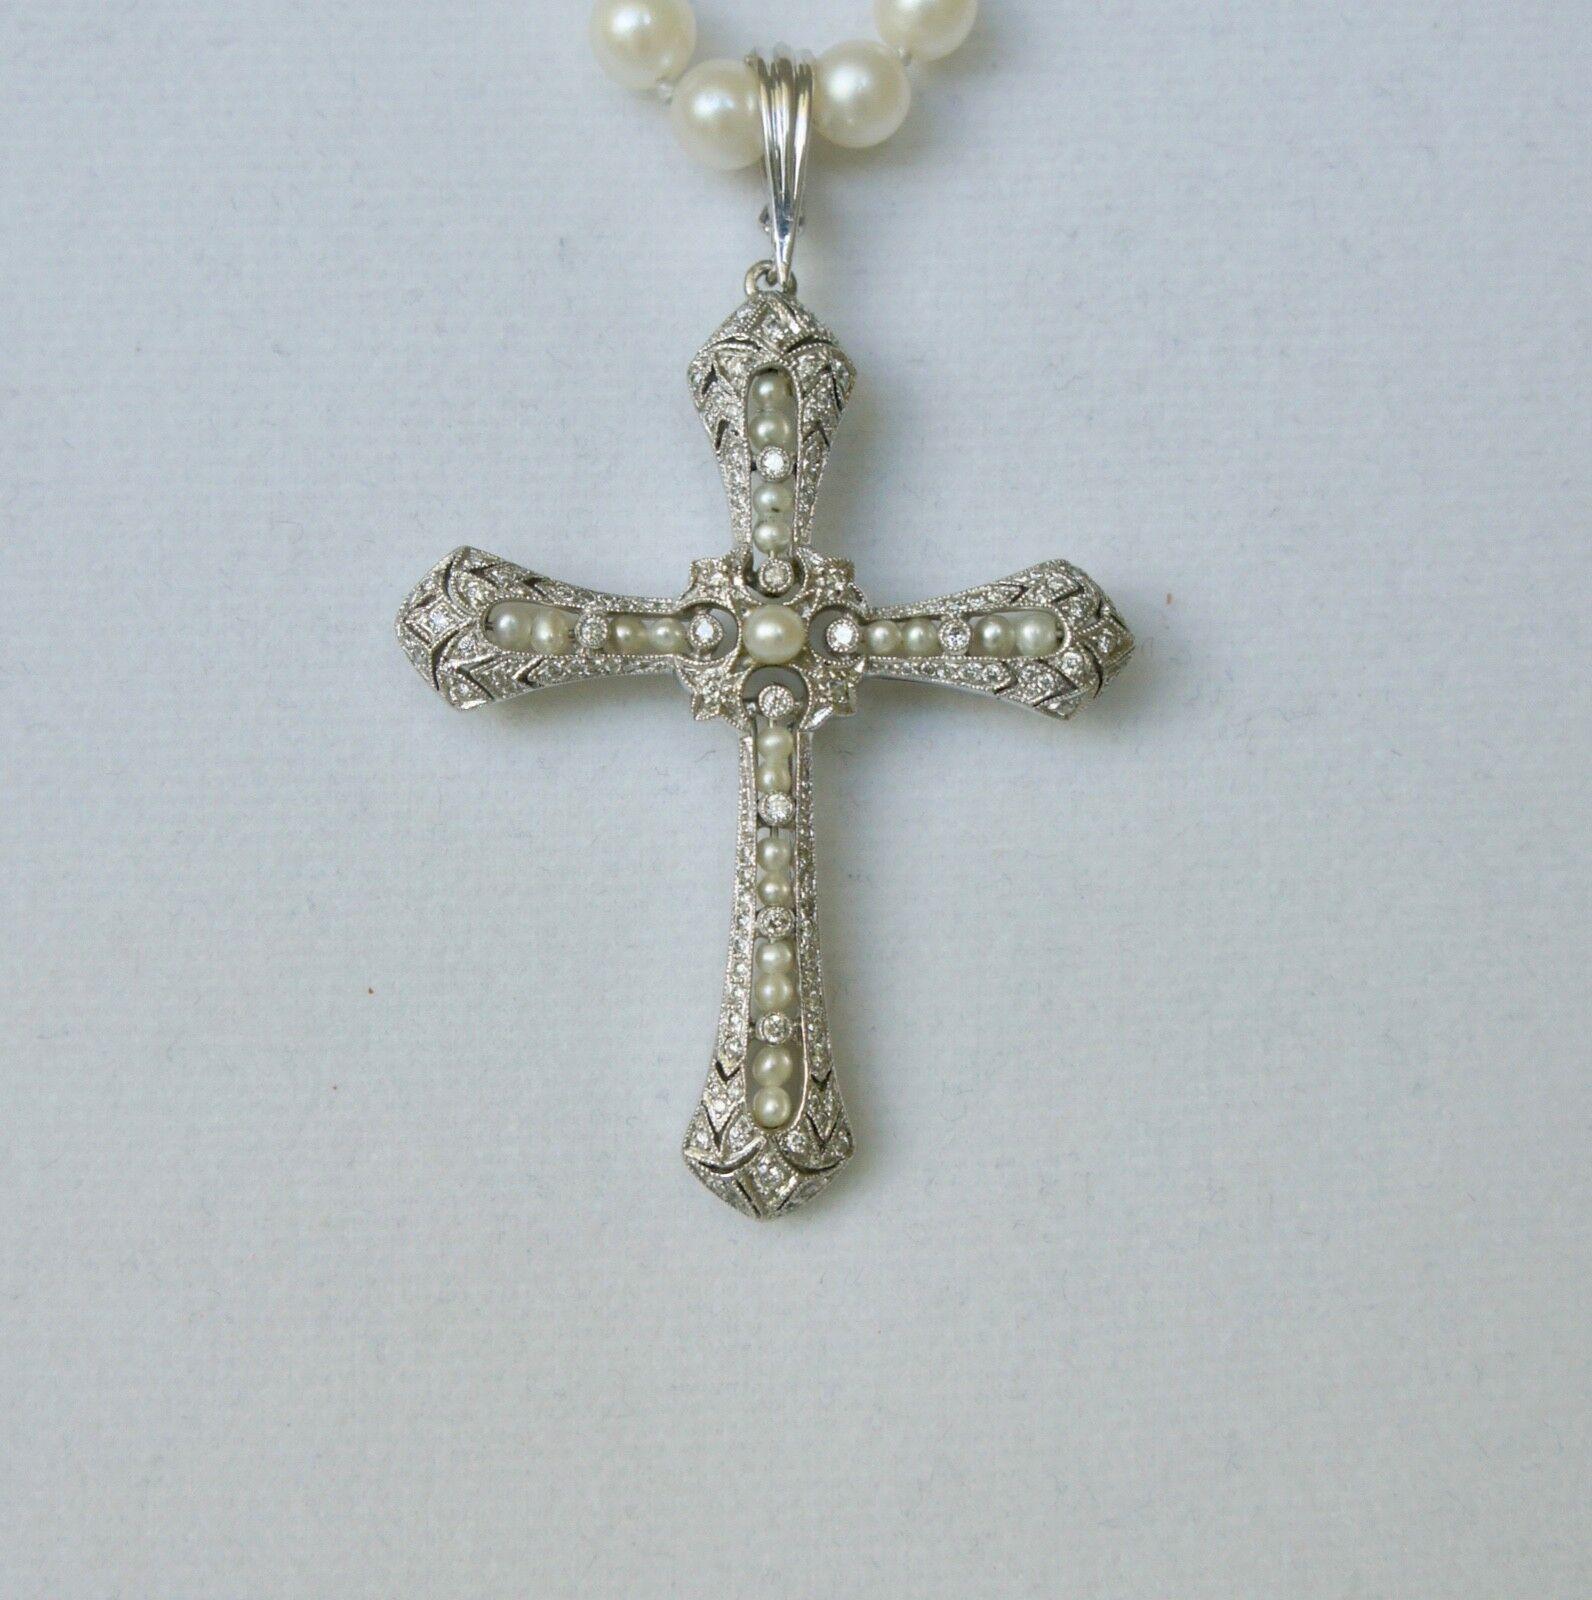 3a85d697a12 Antique Beautiful Diamond   Pearl Platinum Cross Pendant 110 Diamonds 14.2  gr. nijpfp793-Necklaces   Pendants